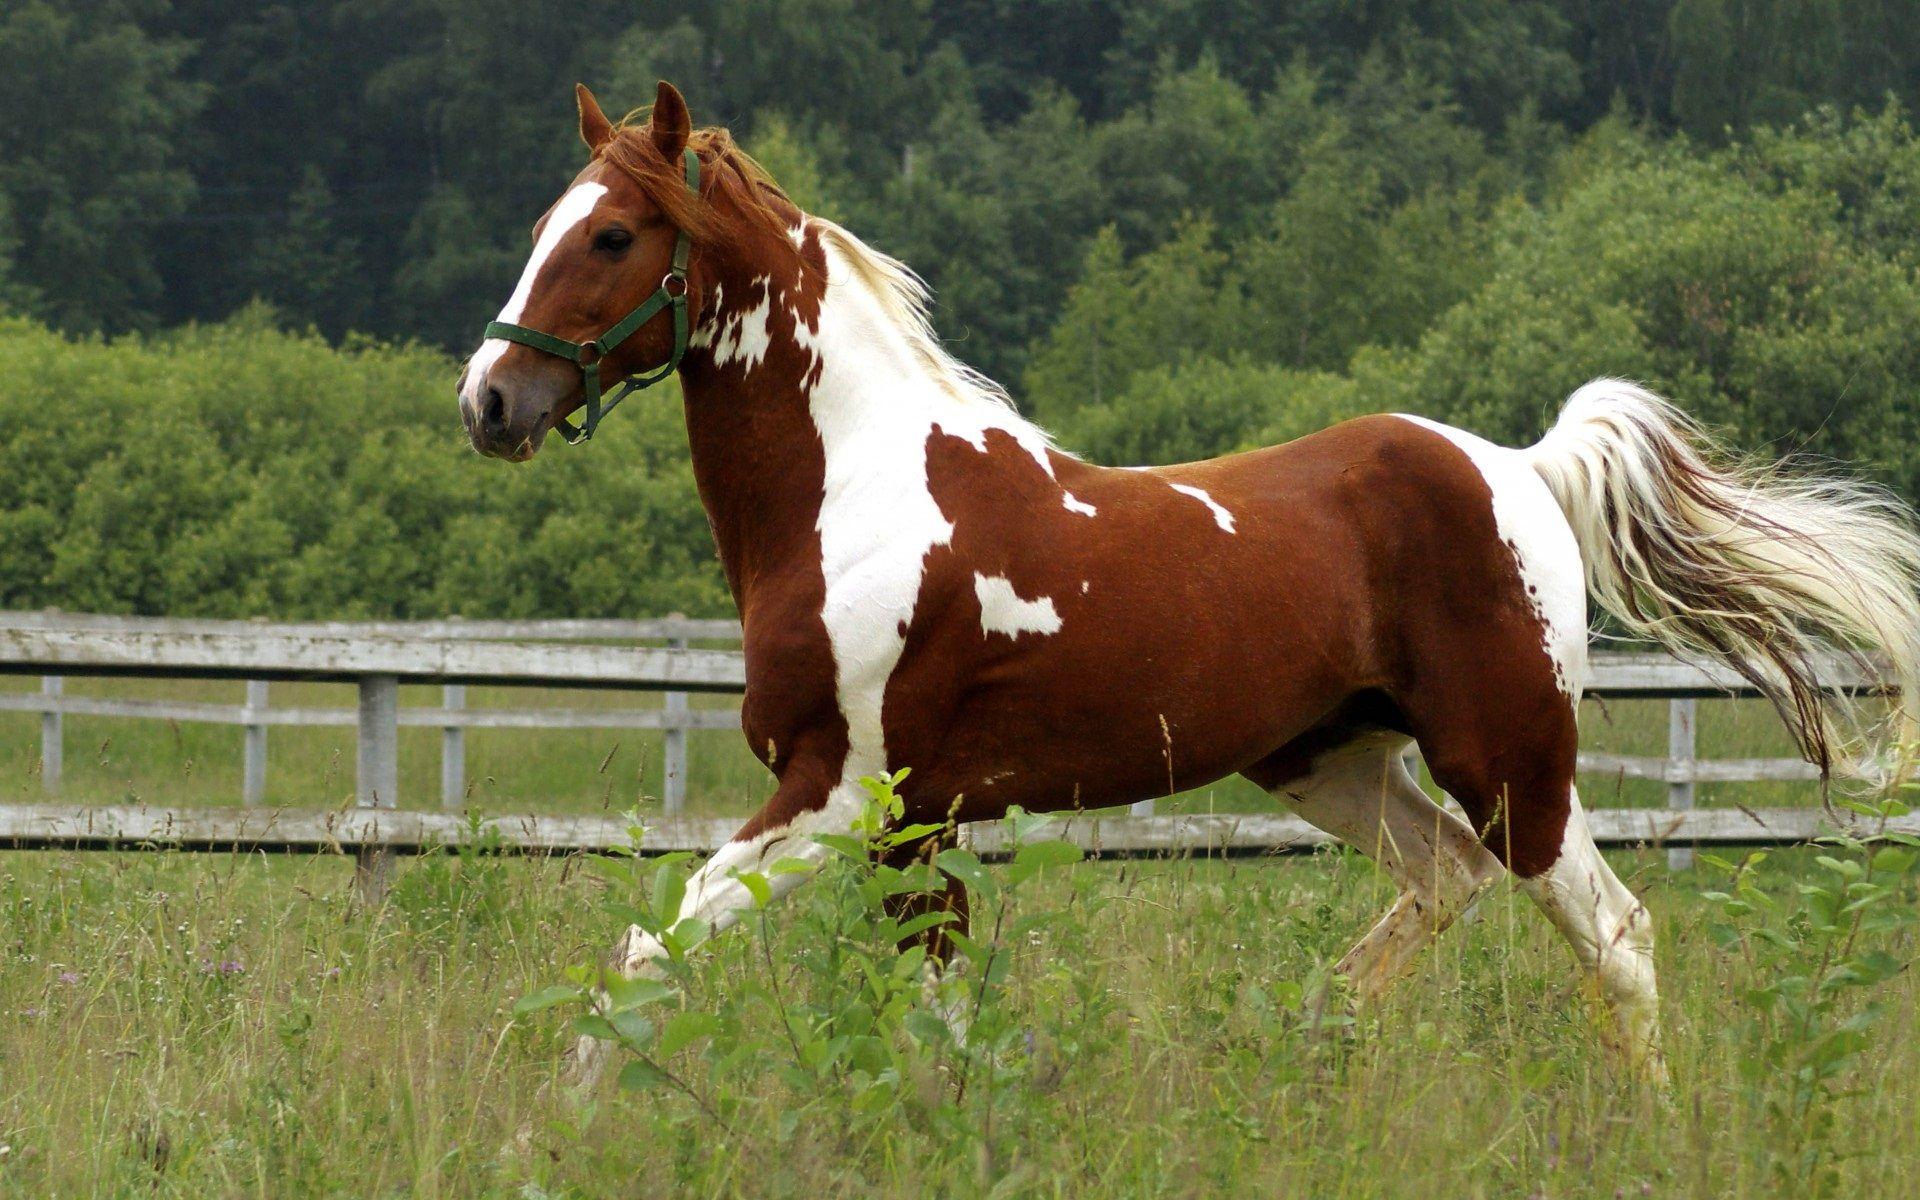 Download Horses 6713 1600x1200 px High Resolution Wallpaper 1920x1200